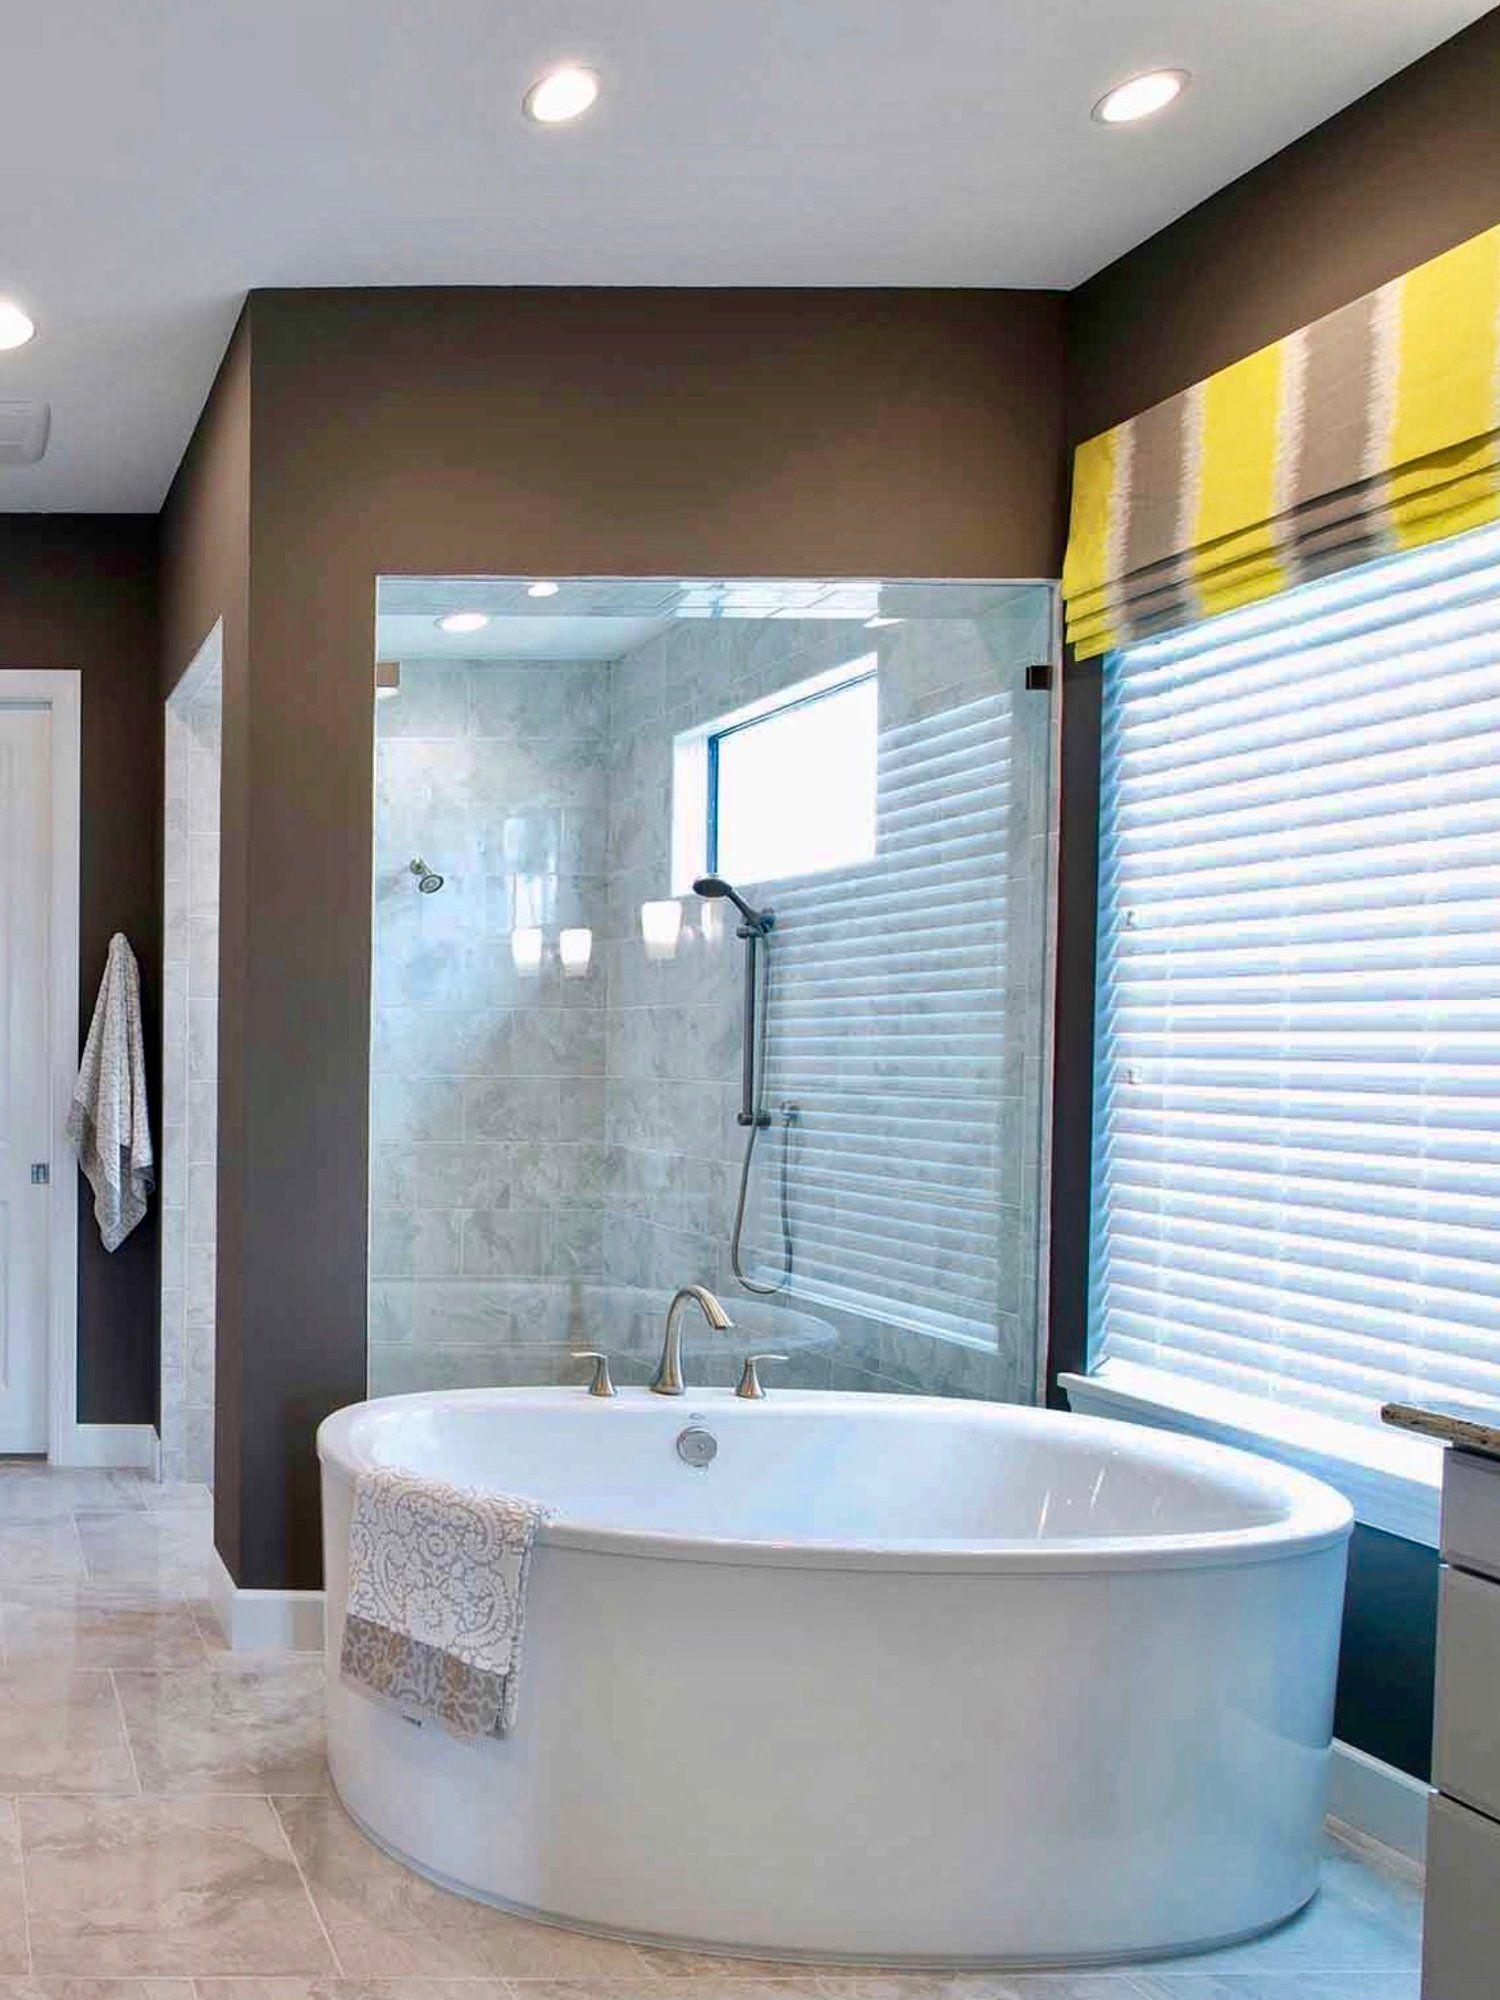 28 Arousing Master Bathroom Designs🚿 | Master bathrooms, Bathroom ...